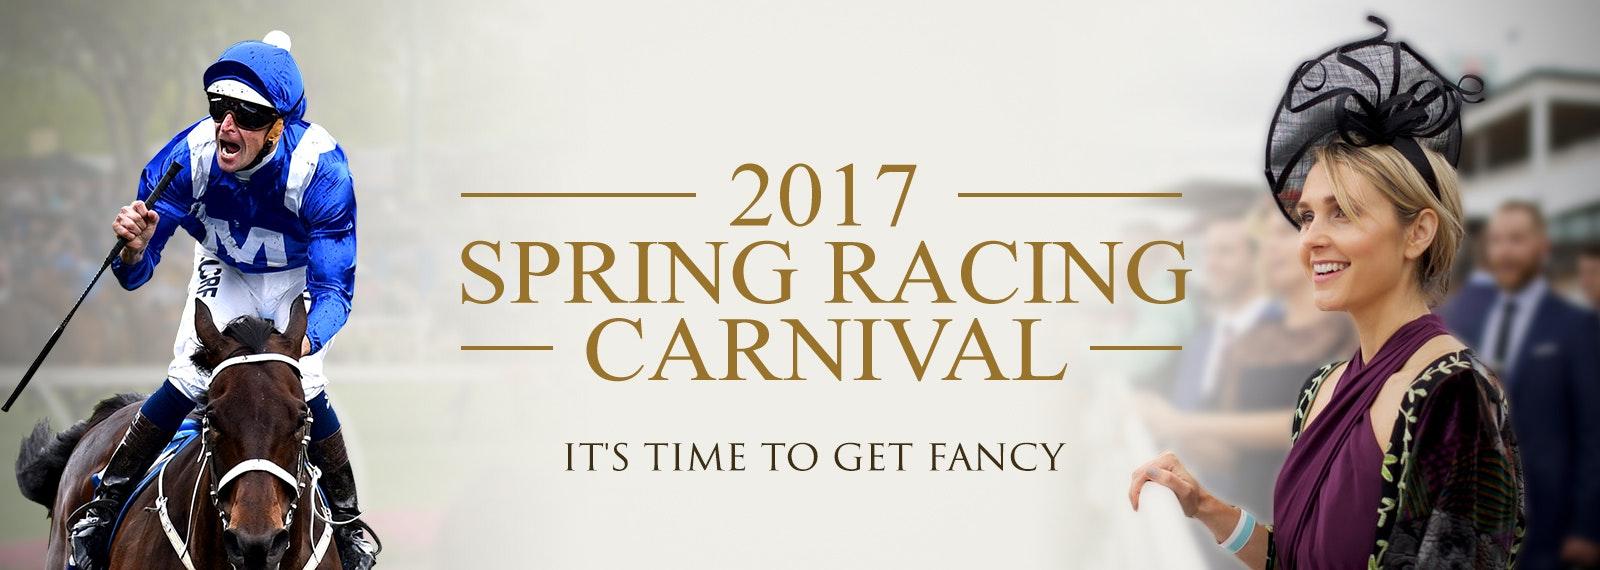 2017 SPRING RACING CARNIVAL